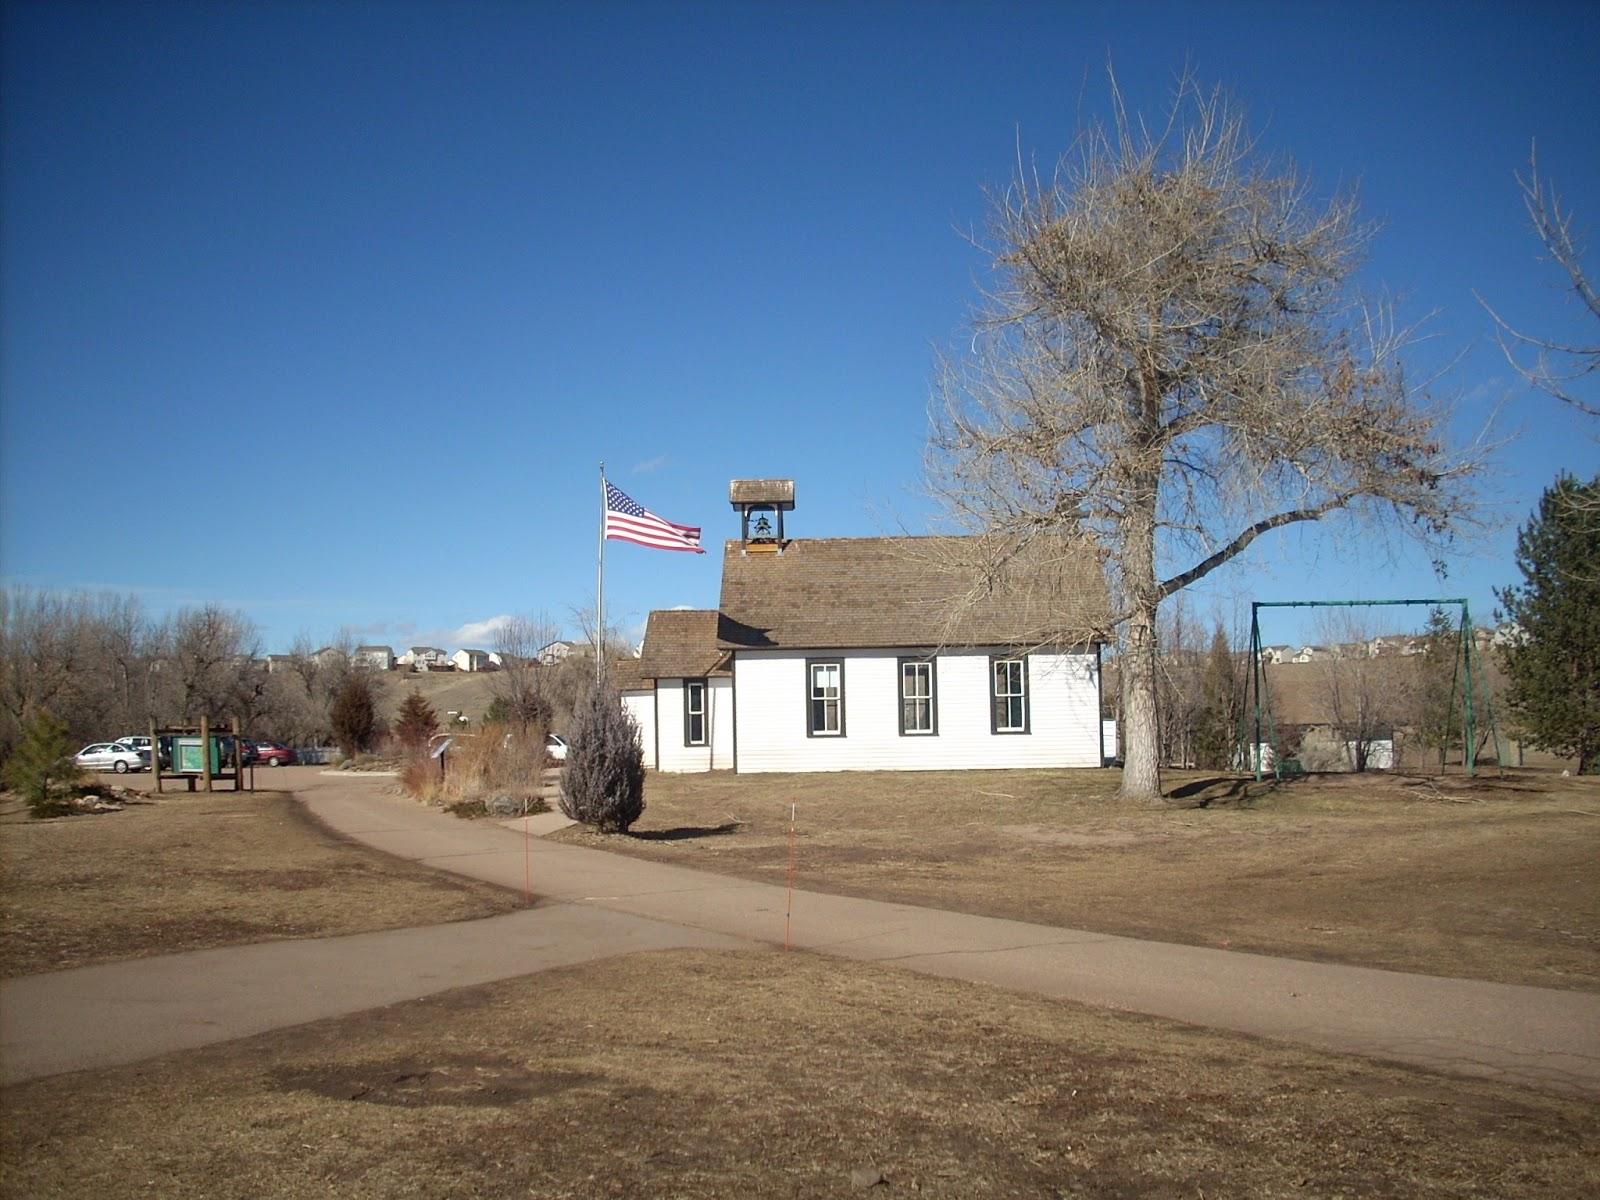 Explore Colorado Chatfield Botanic Gardens The School